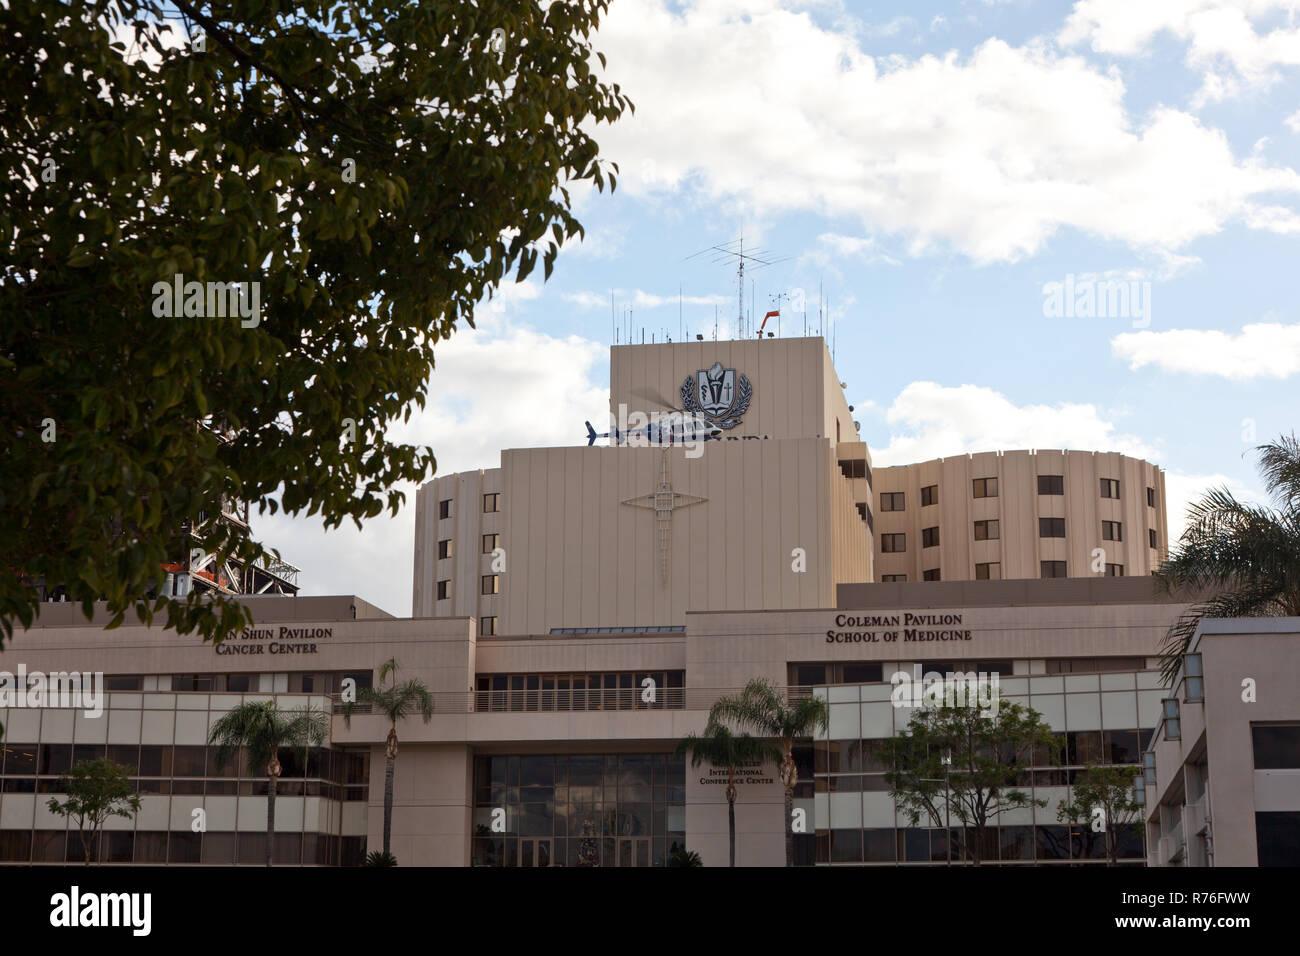 Helicopter at Loma Linda University Hospital in Loma Linda, CA, USA - Stock Image